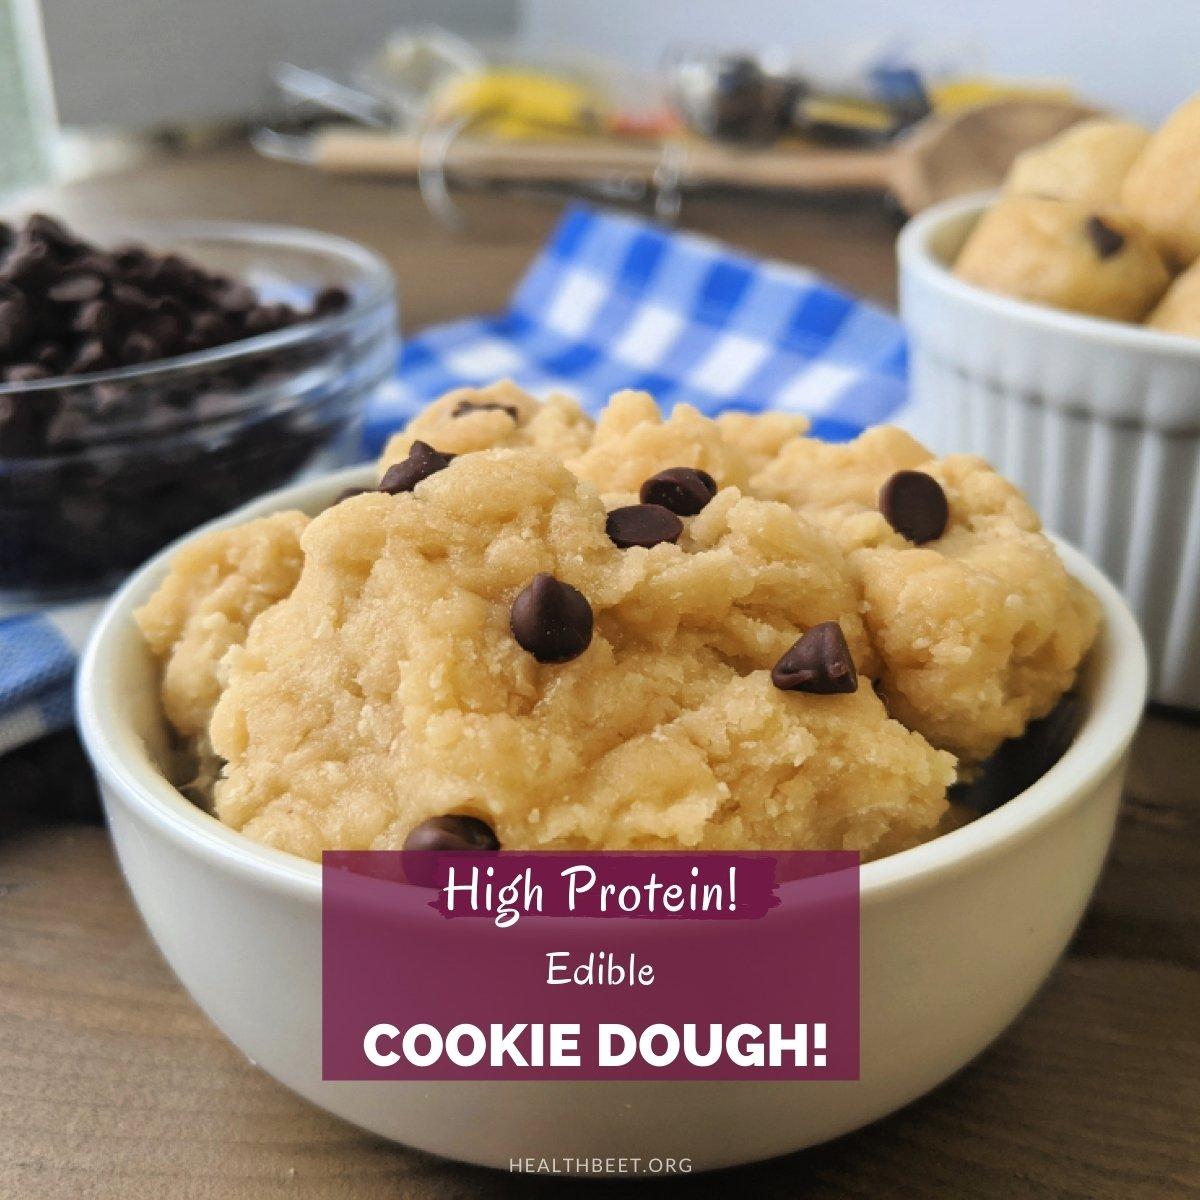 high protein edible cookie dough thumbnail